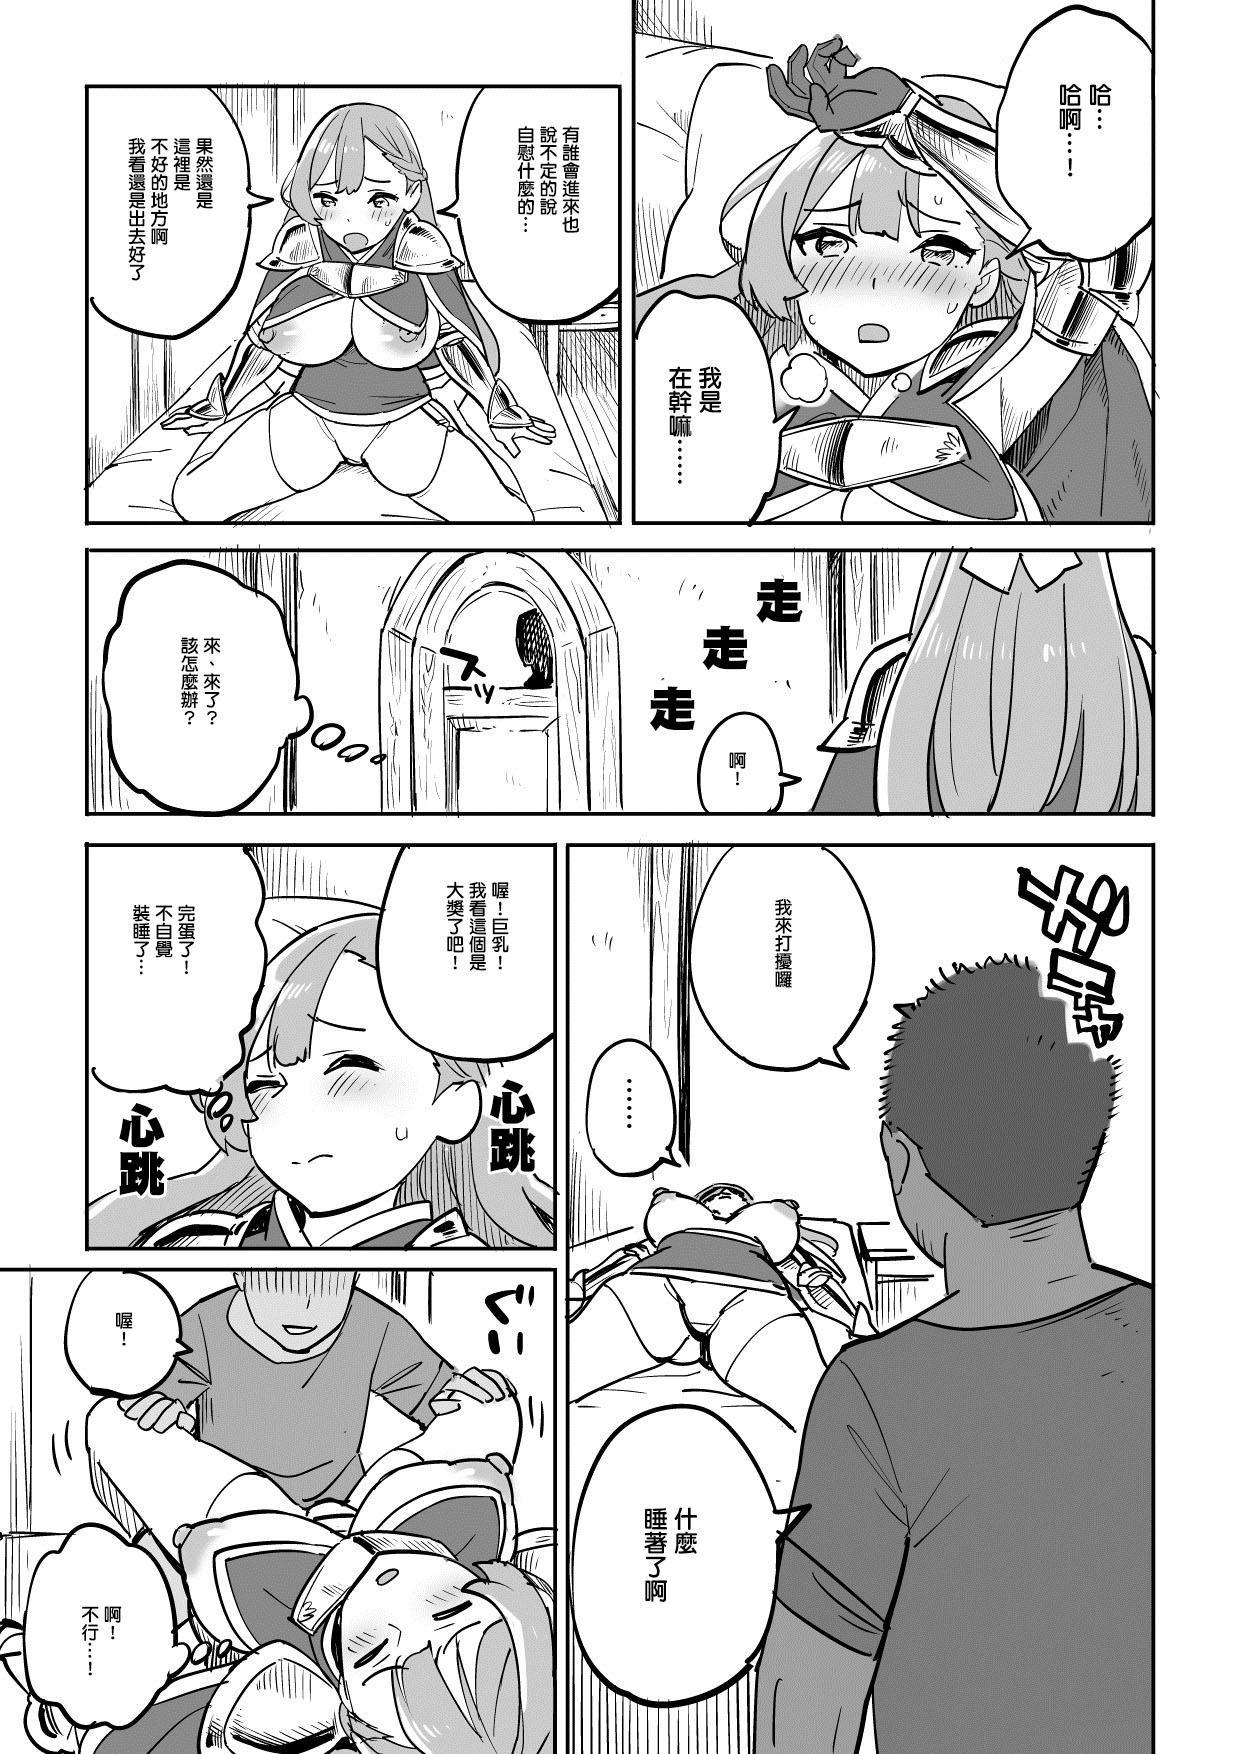 Tada no Yado ni wa Goyoujin! 12